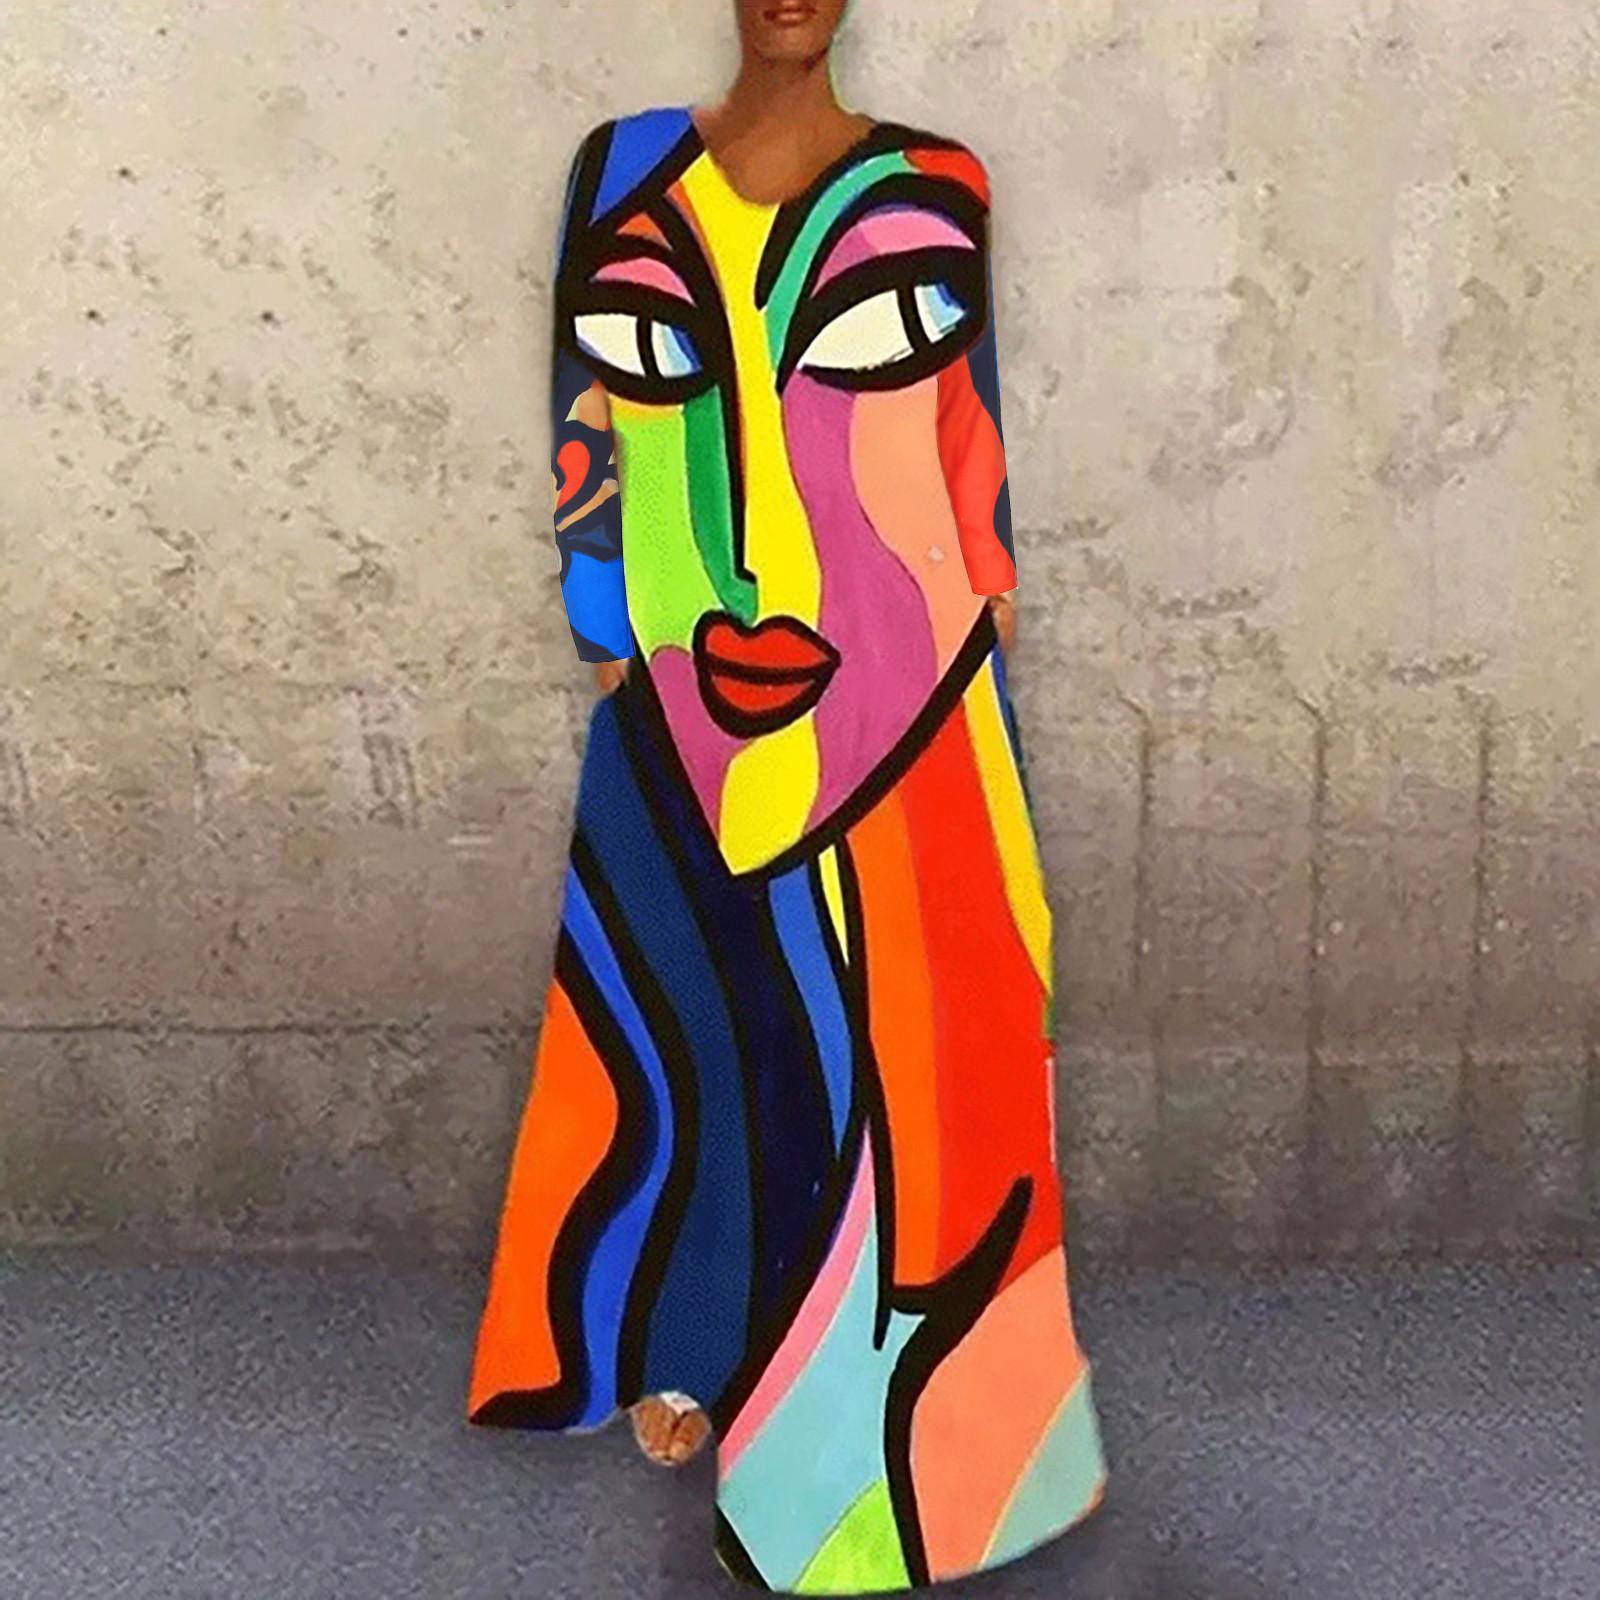 4# Elegant Vintage Dress Women Creative Print Casual Long Sleeve O neck Loose Dresses Plus Size Slim Dresses Vestidos De Fiesta